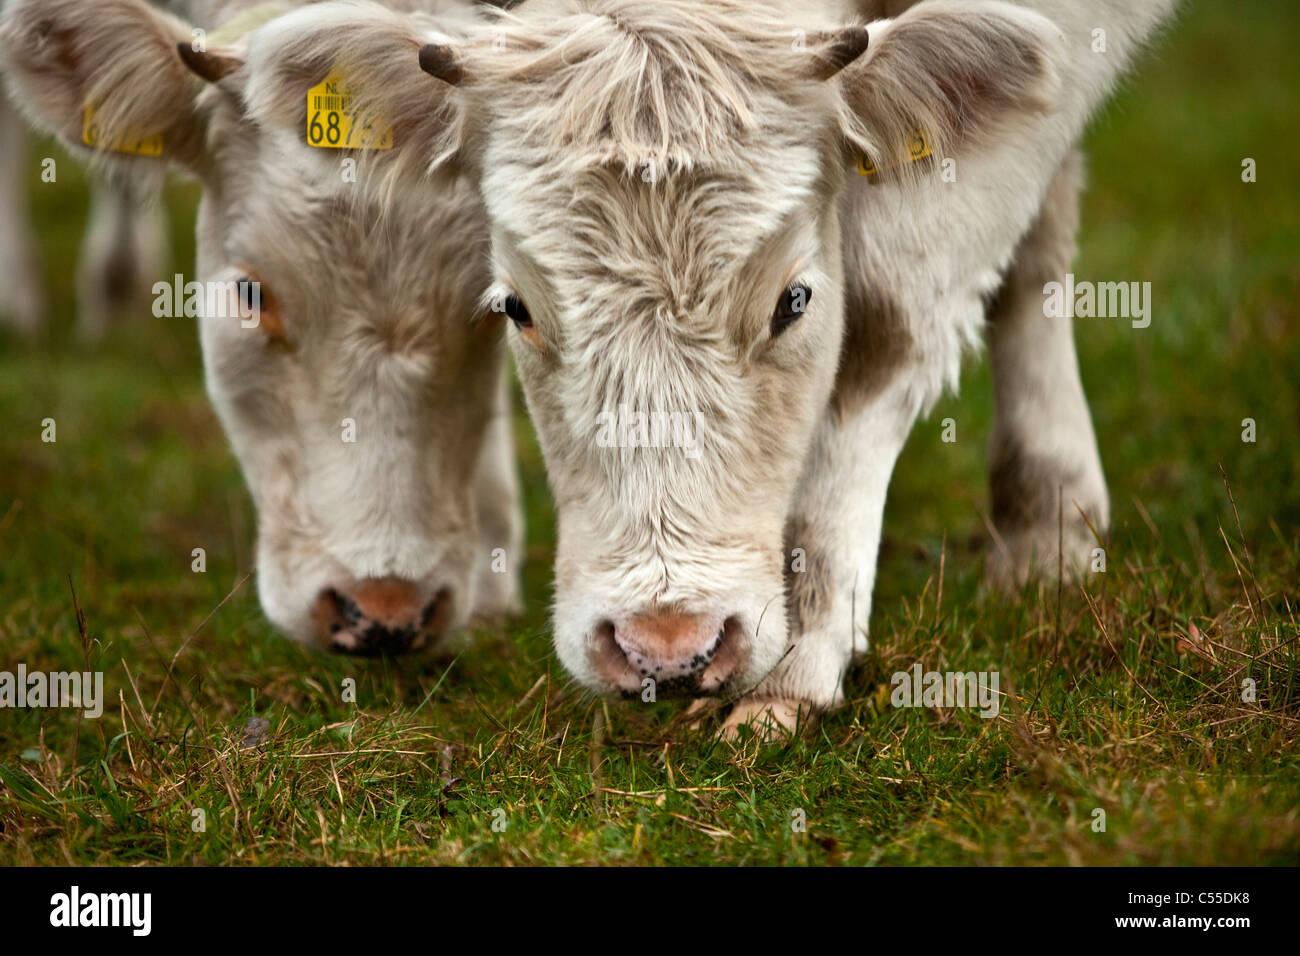 The Netherlands, Winterswijk, Cows. - Stock Image